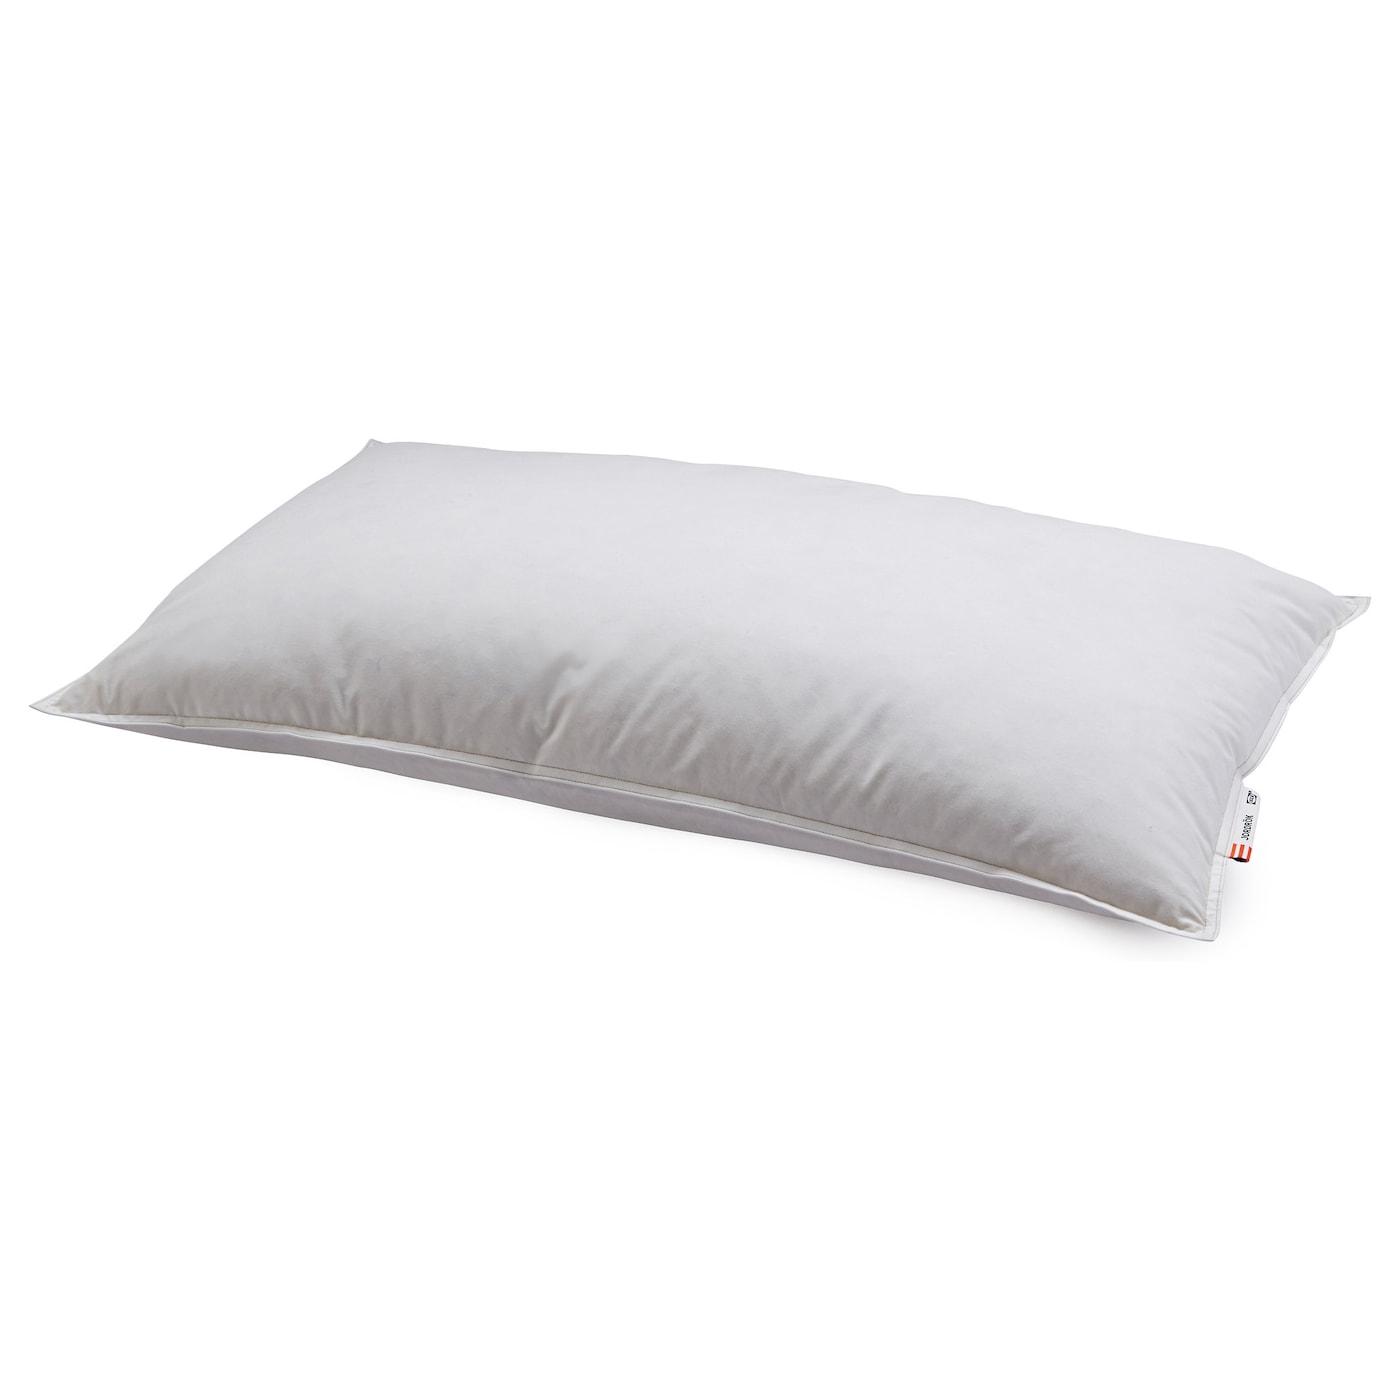 Jordr k pillow firmer 50 x 80 cm ikea - Almohadas en ikea ...